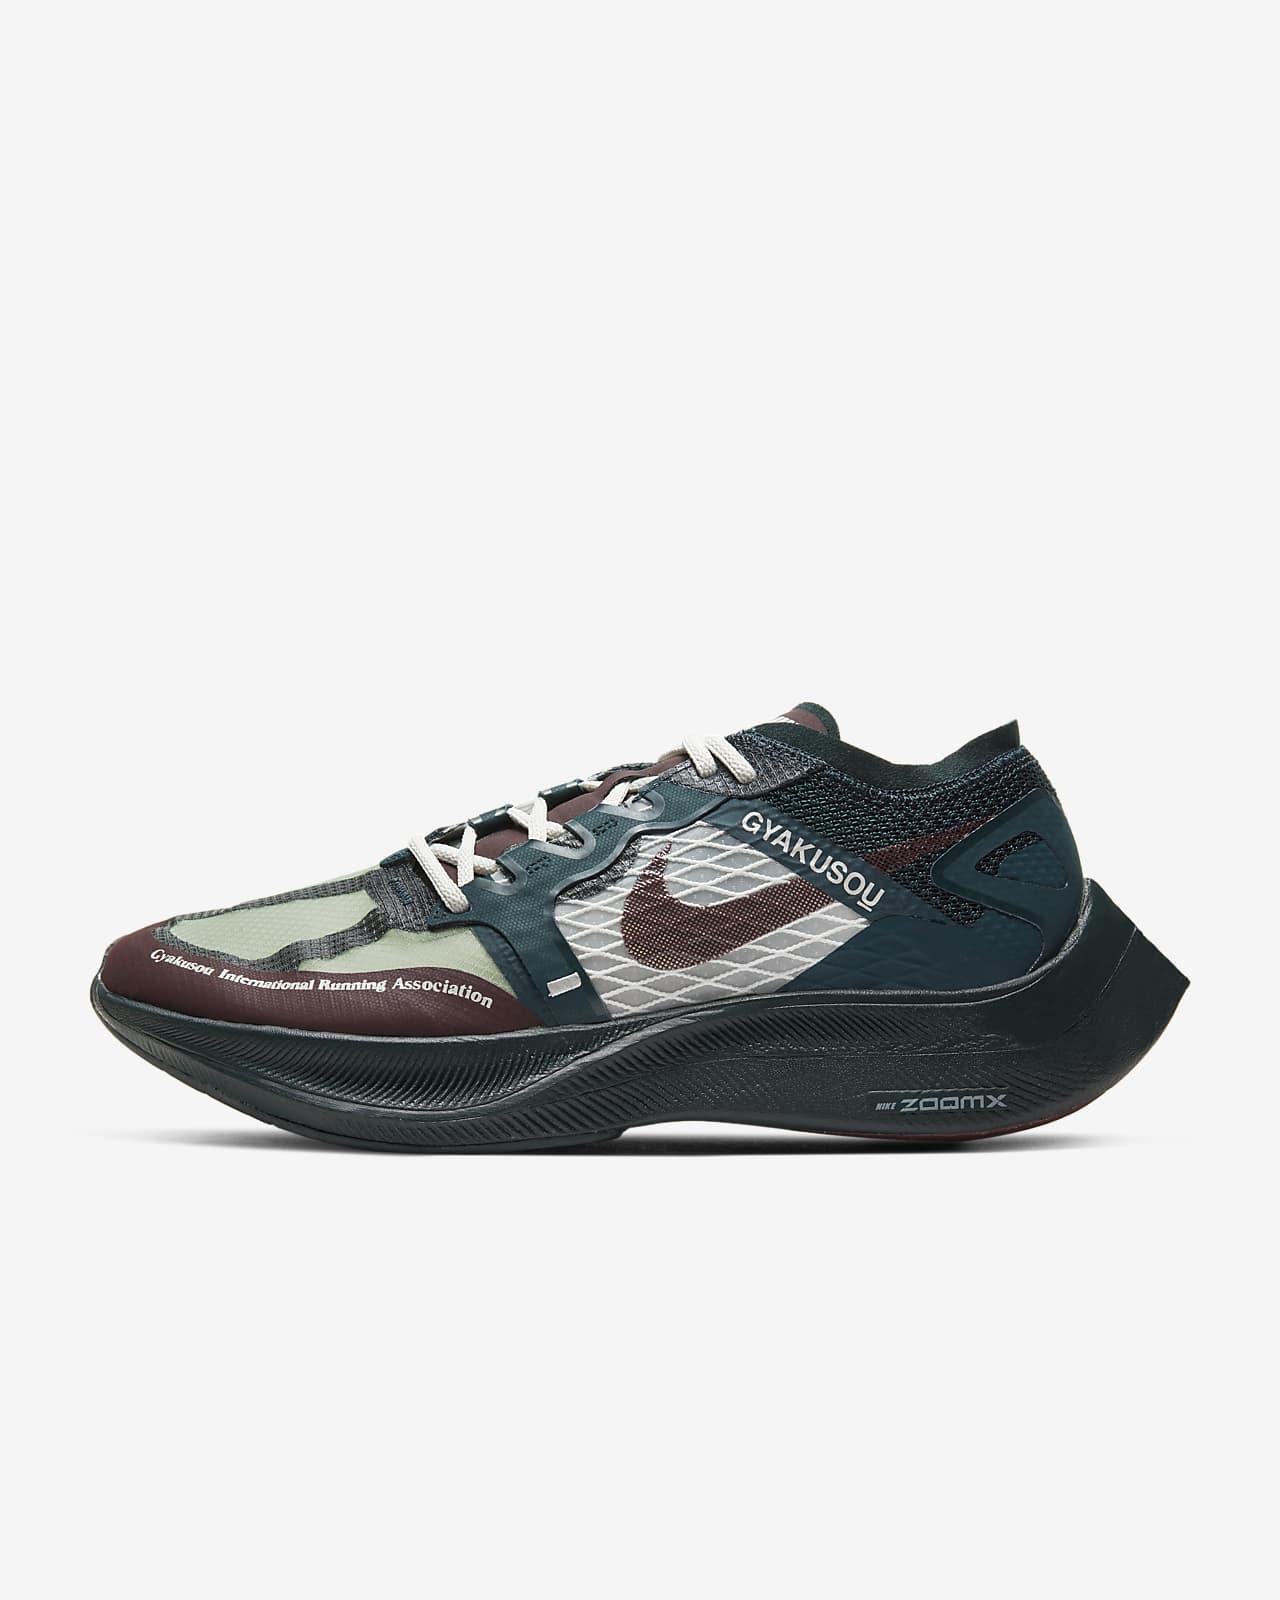 Nike ZoomX Vaporfly Next% x Gyakusou Running Shoes